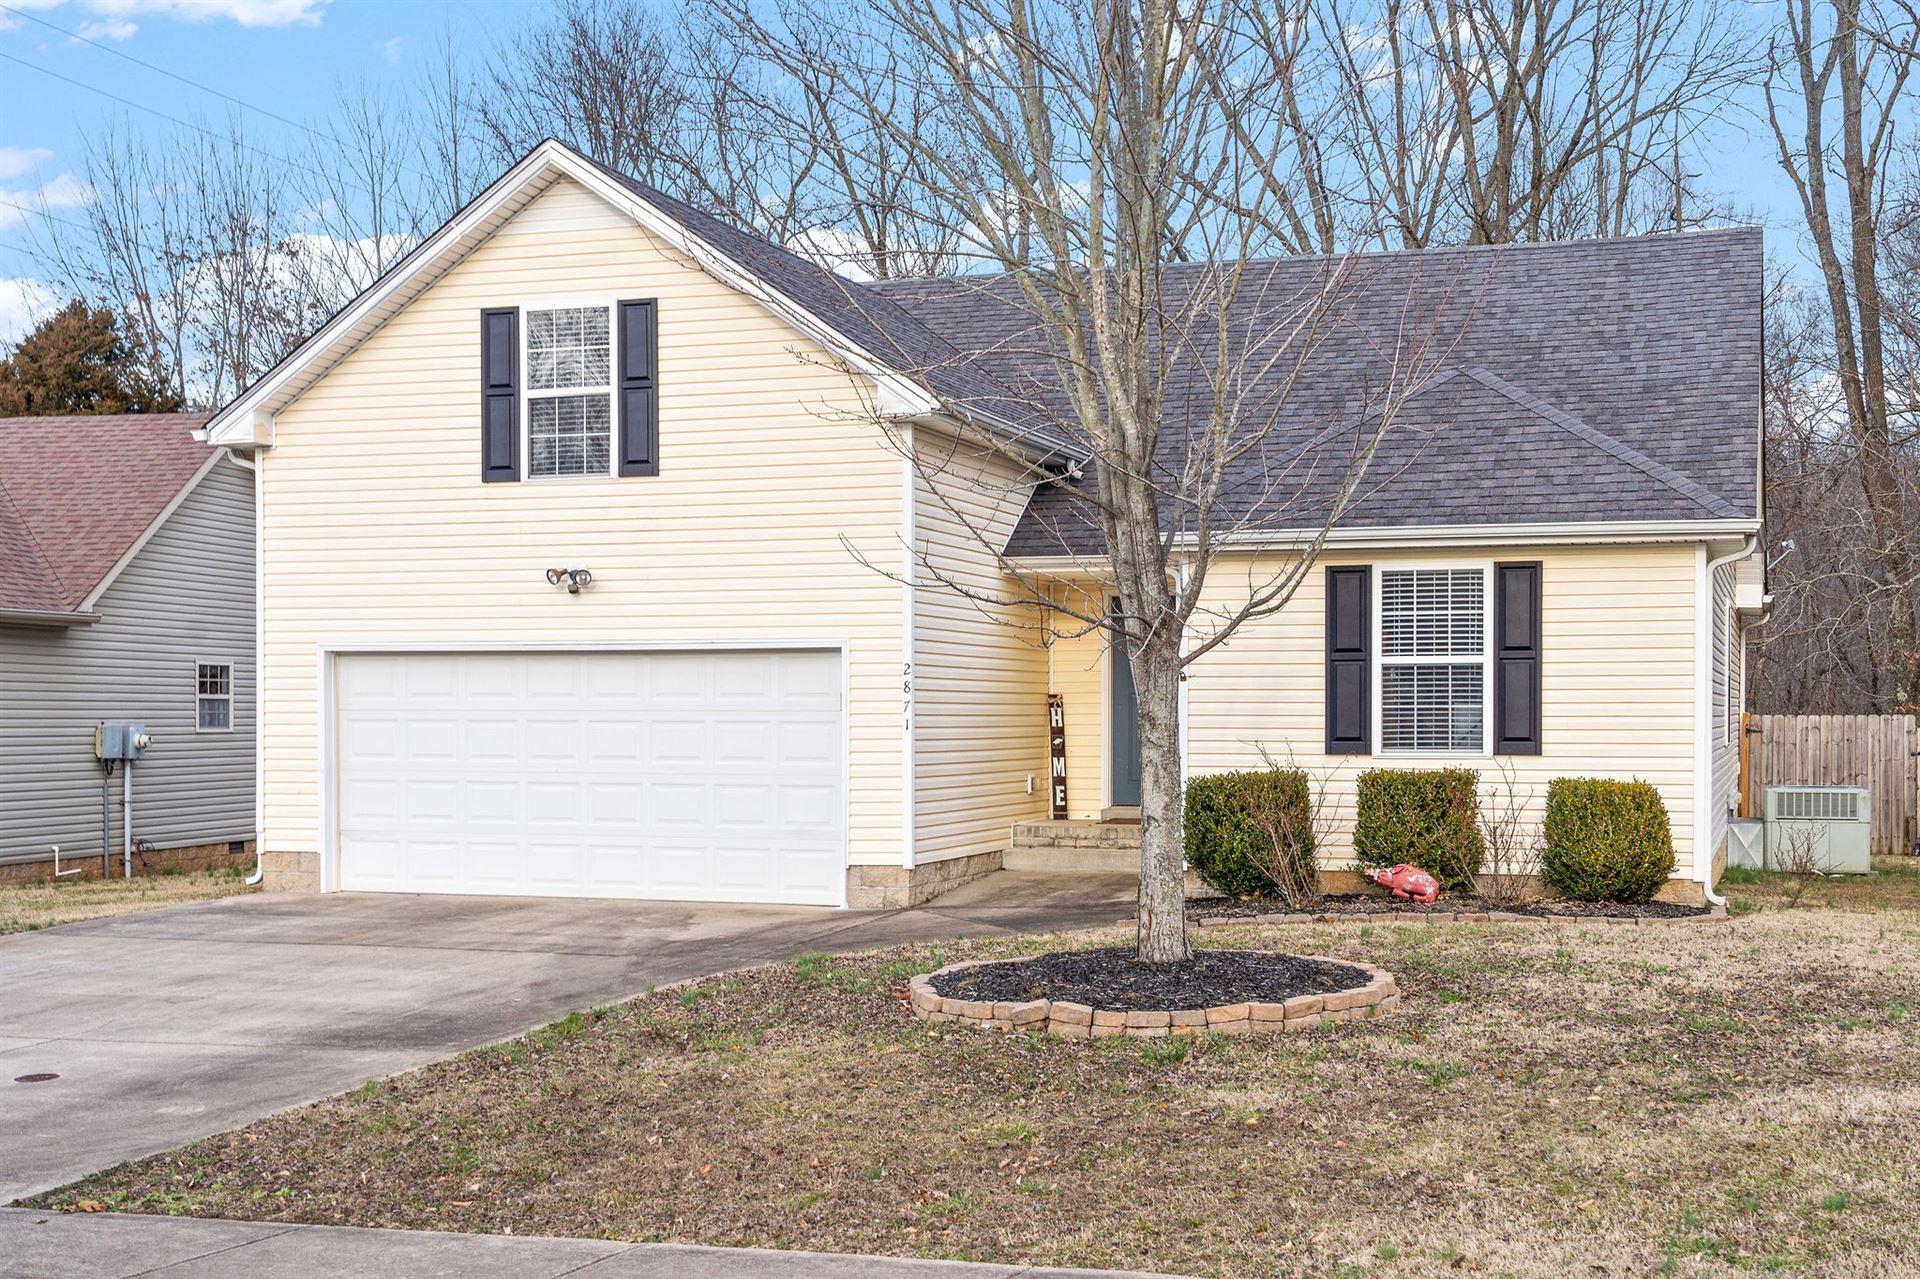 2871 Teakwood Dr, Clarksville, TN 37040 - MLS#: 2233289